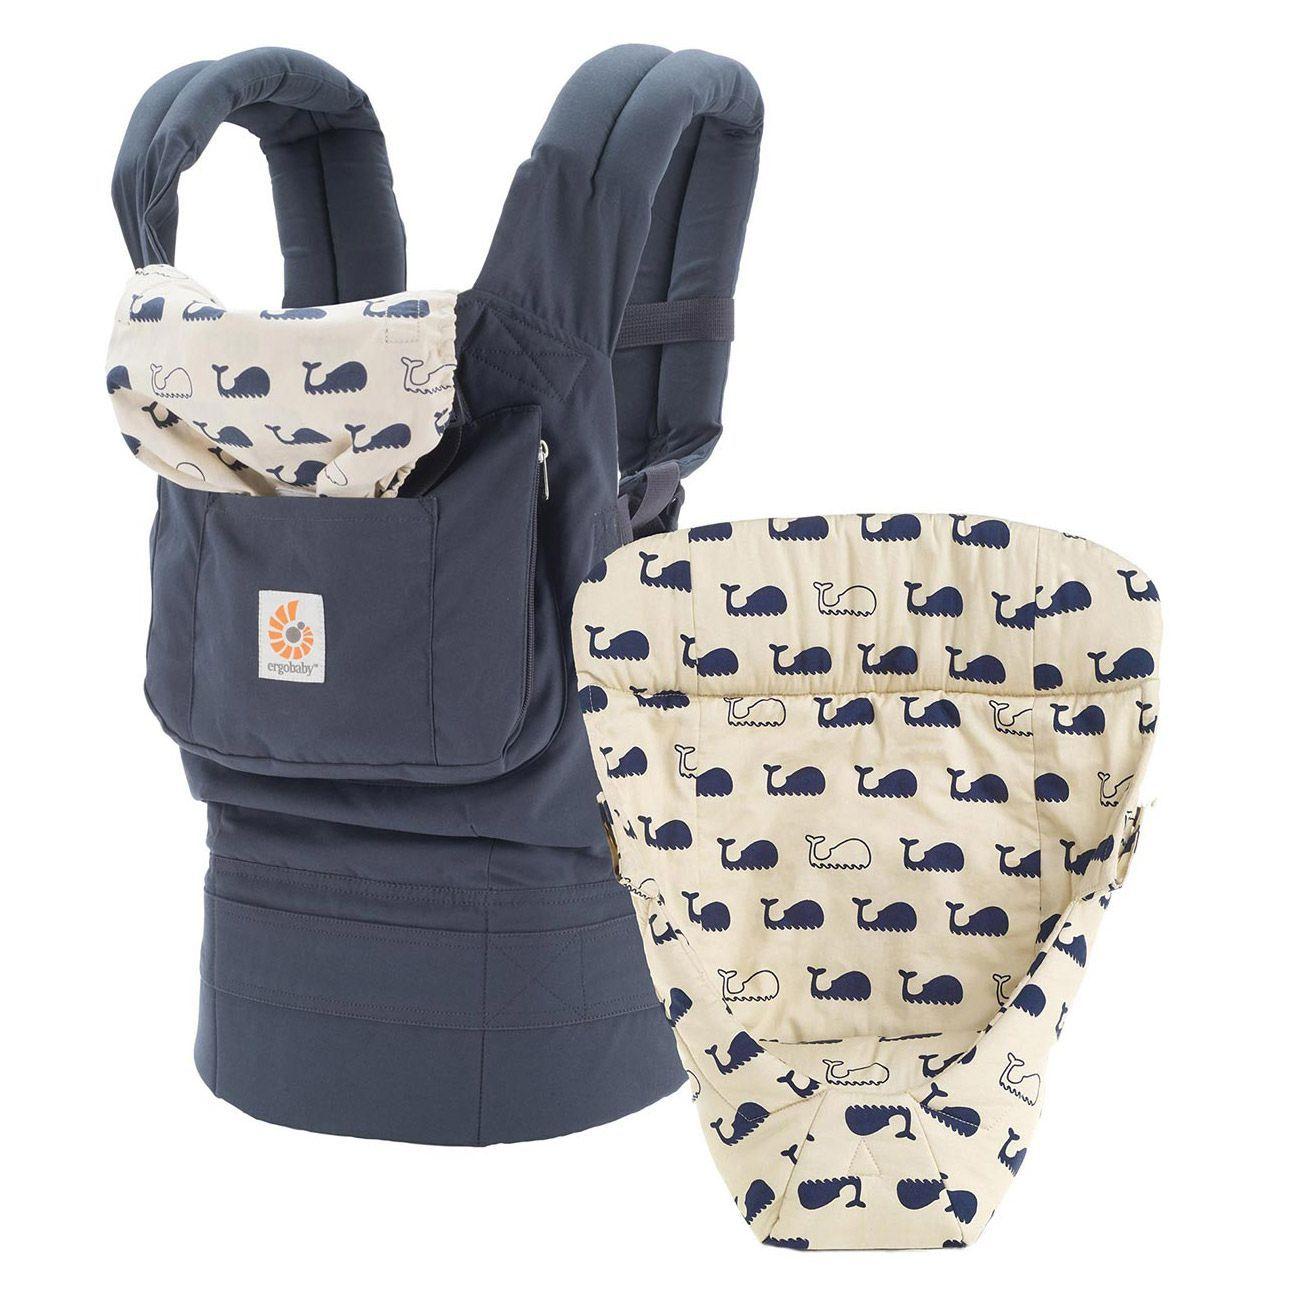 efc56eedbbd Ergobaby Original Baby Carrier - Bundle of Joy with Easy Snug Infant Insert  - Marine